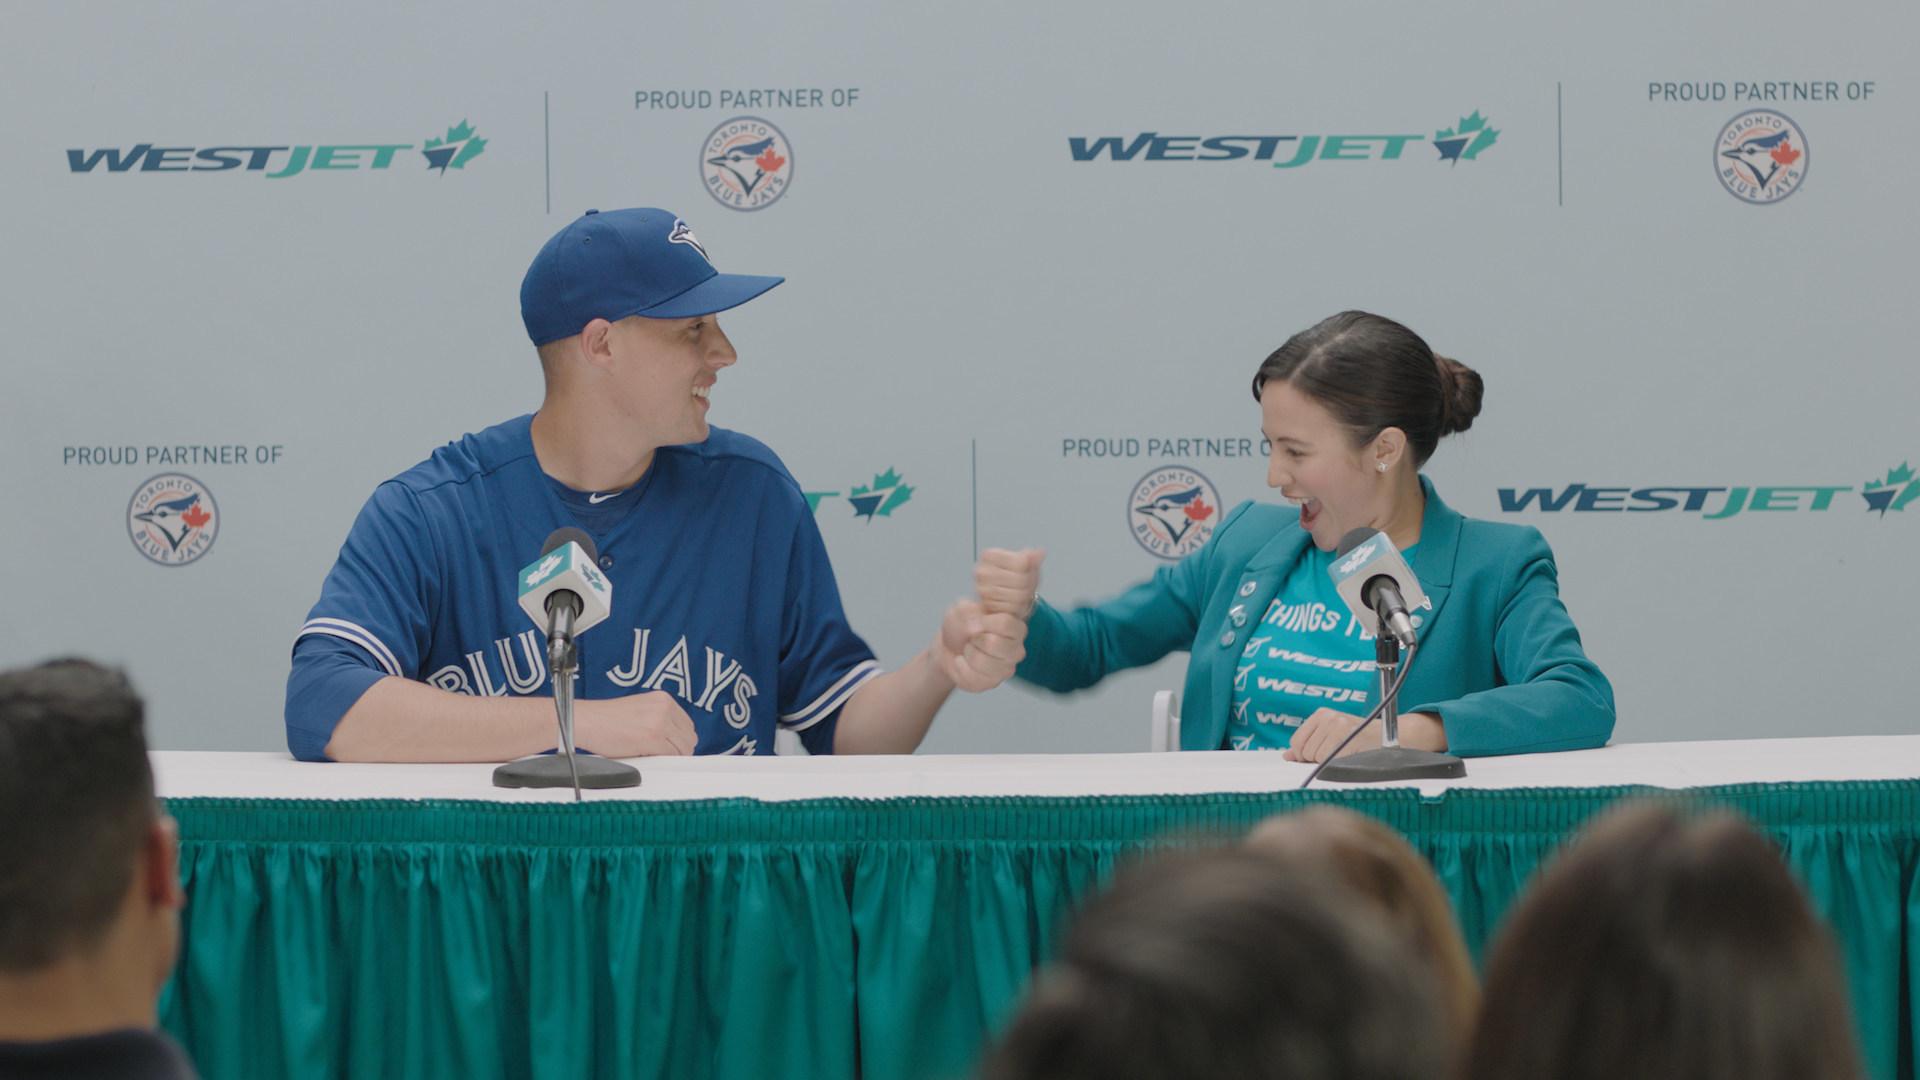 d1772729b18 WESTJET  an Alberta Partnership WestJet debuts super new Toronto.jpg p publish